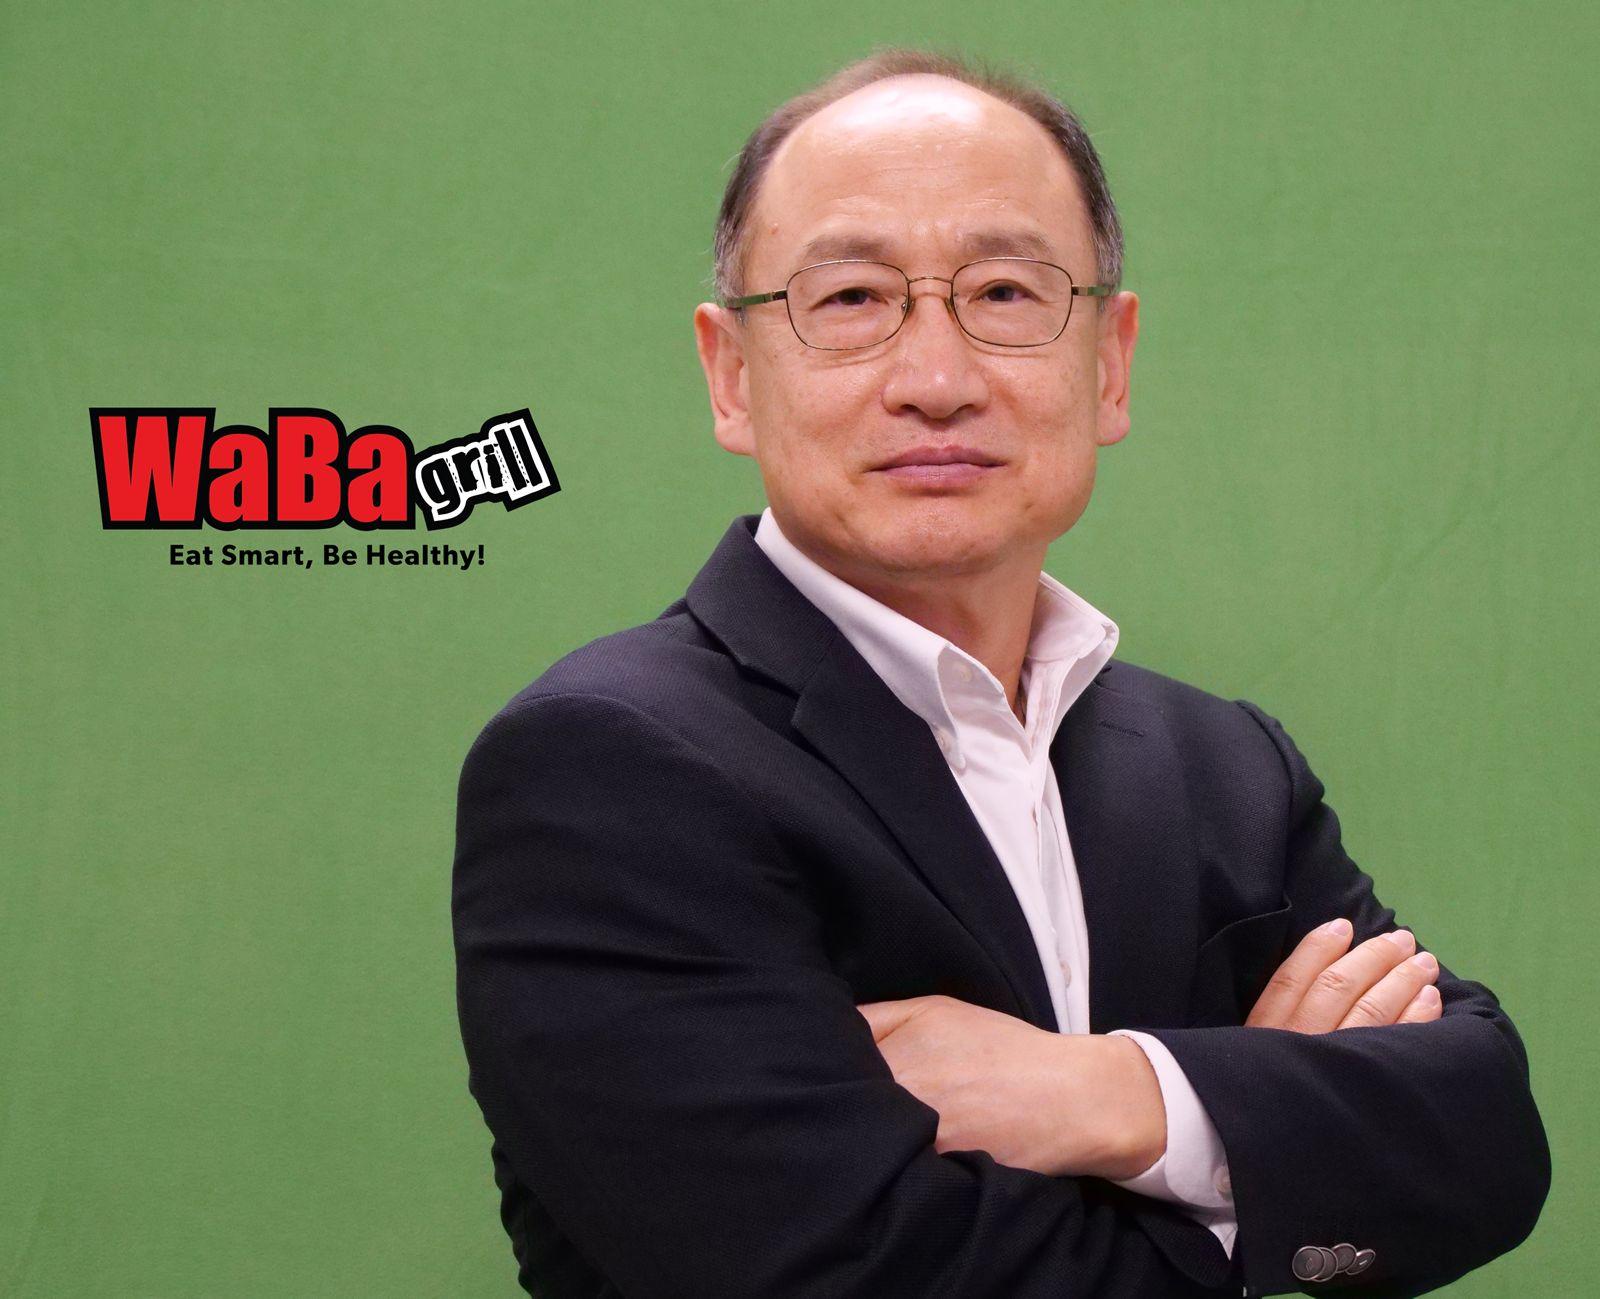 Andrew Kim, President & CEO of WaBa Grill